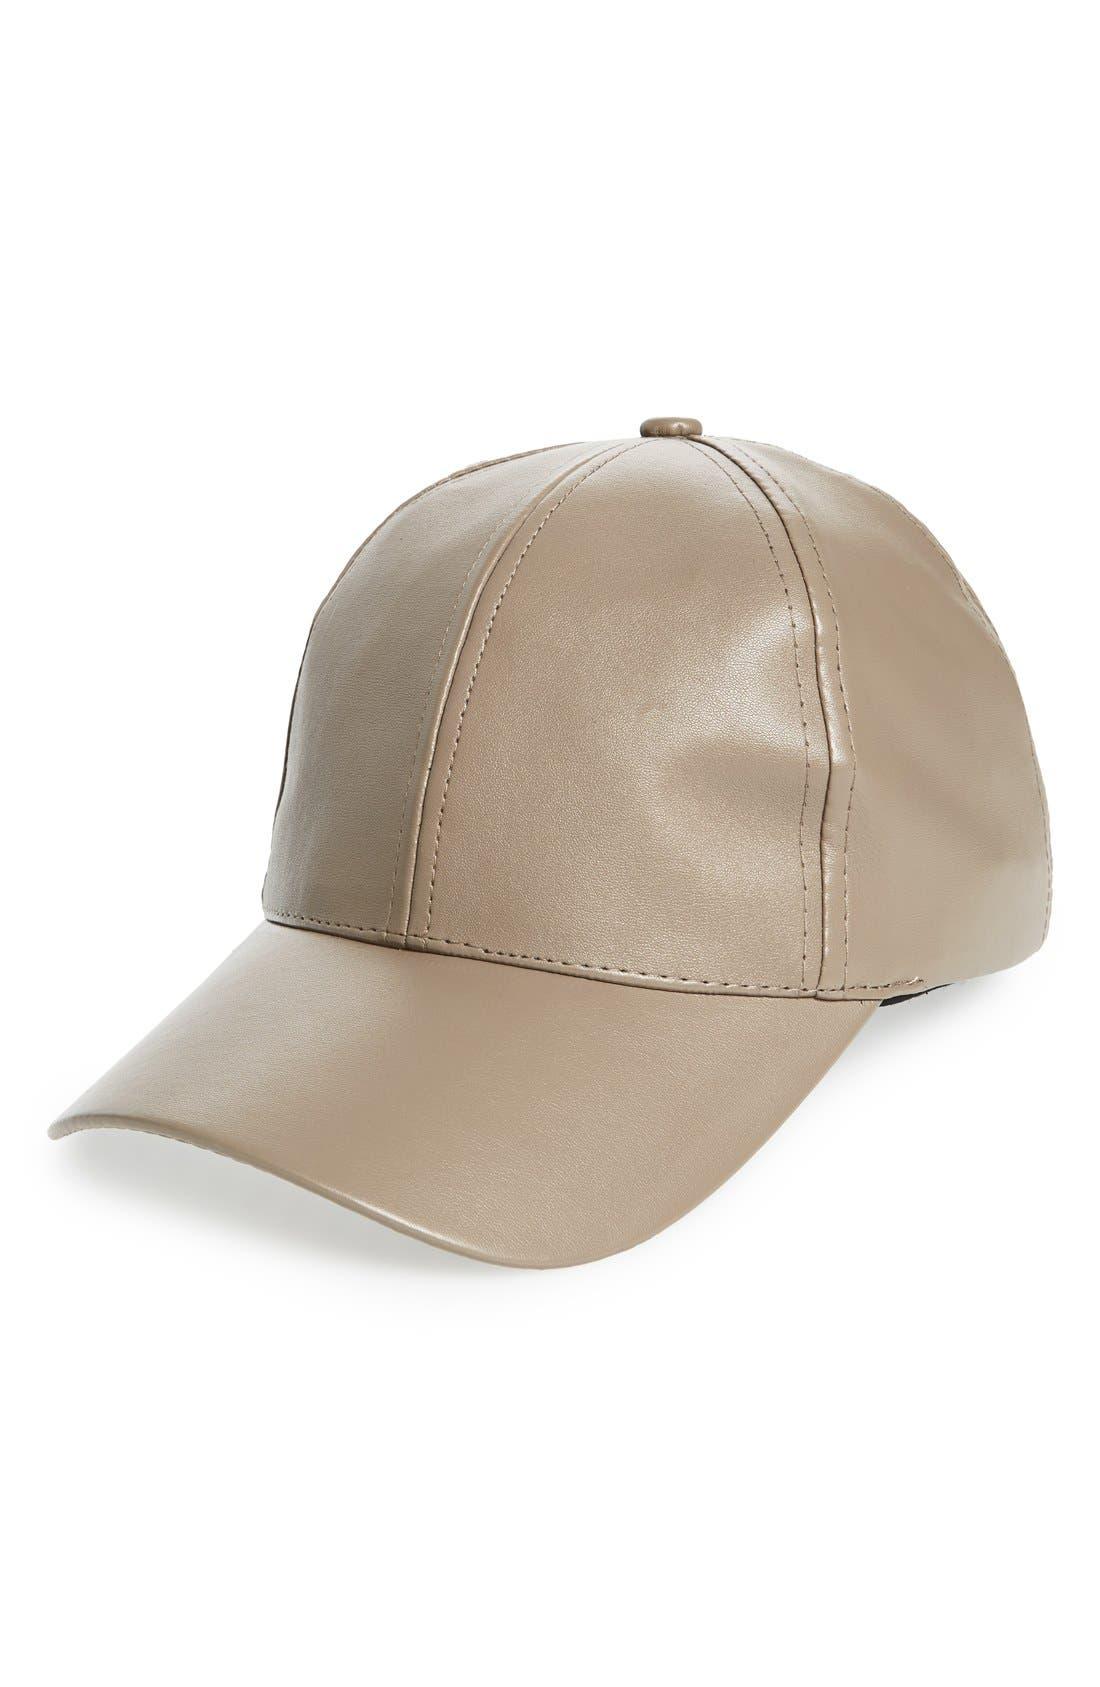 Main Image - Phase 3 Baseball Cap